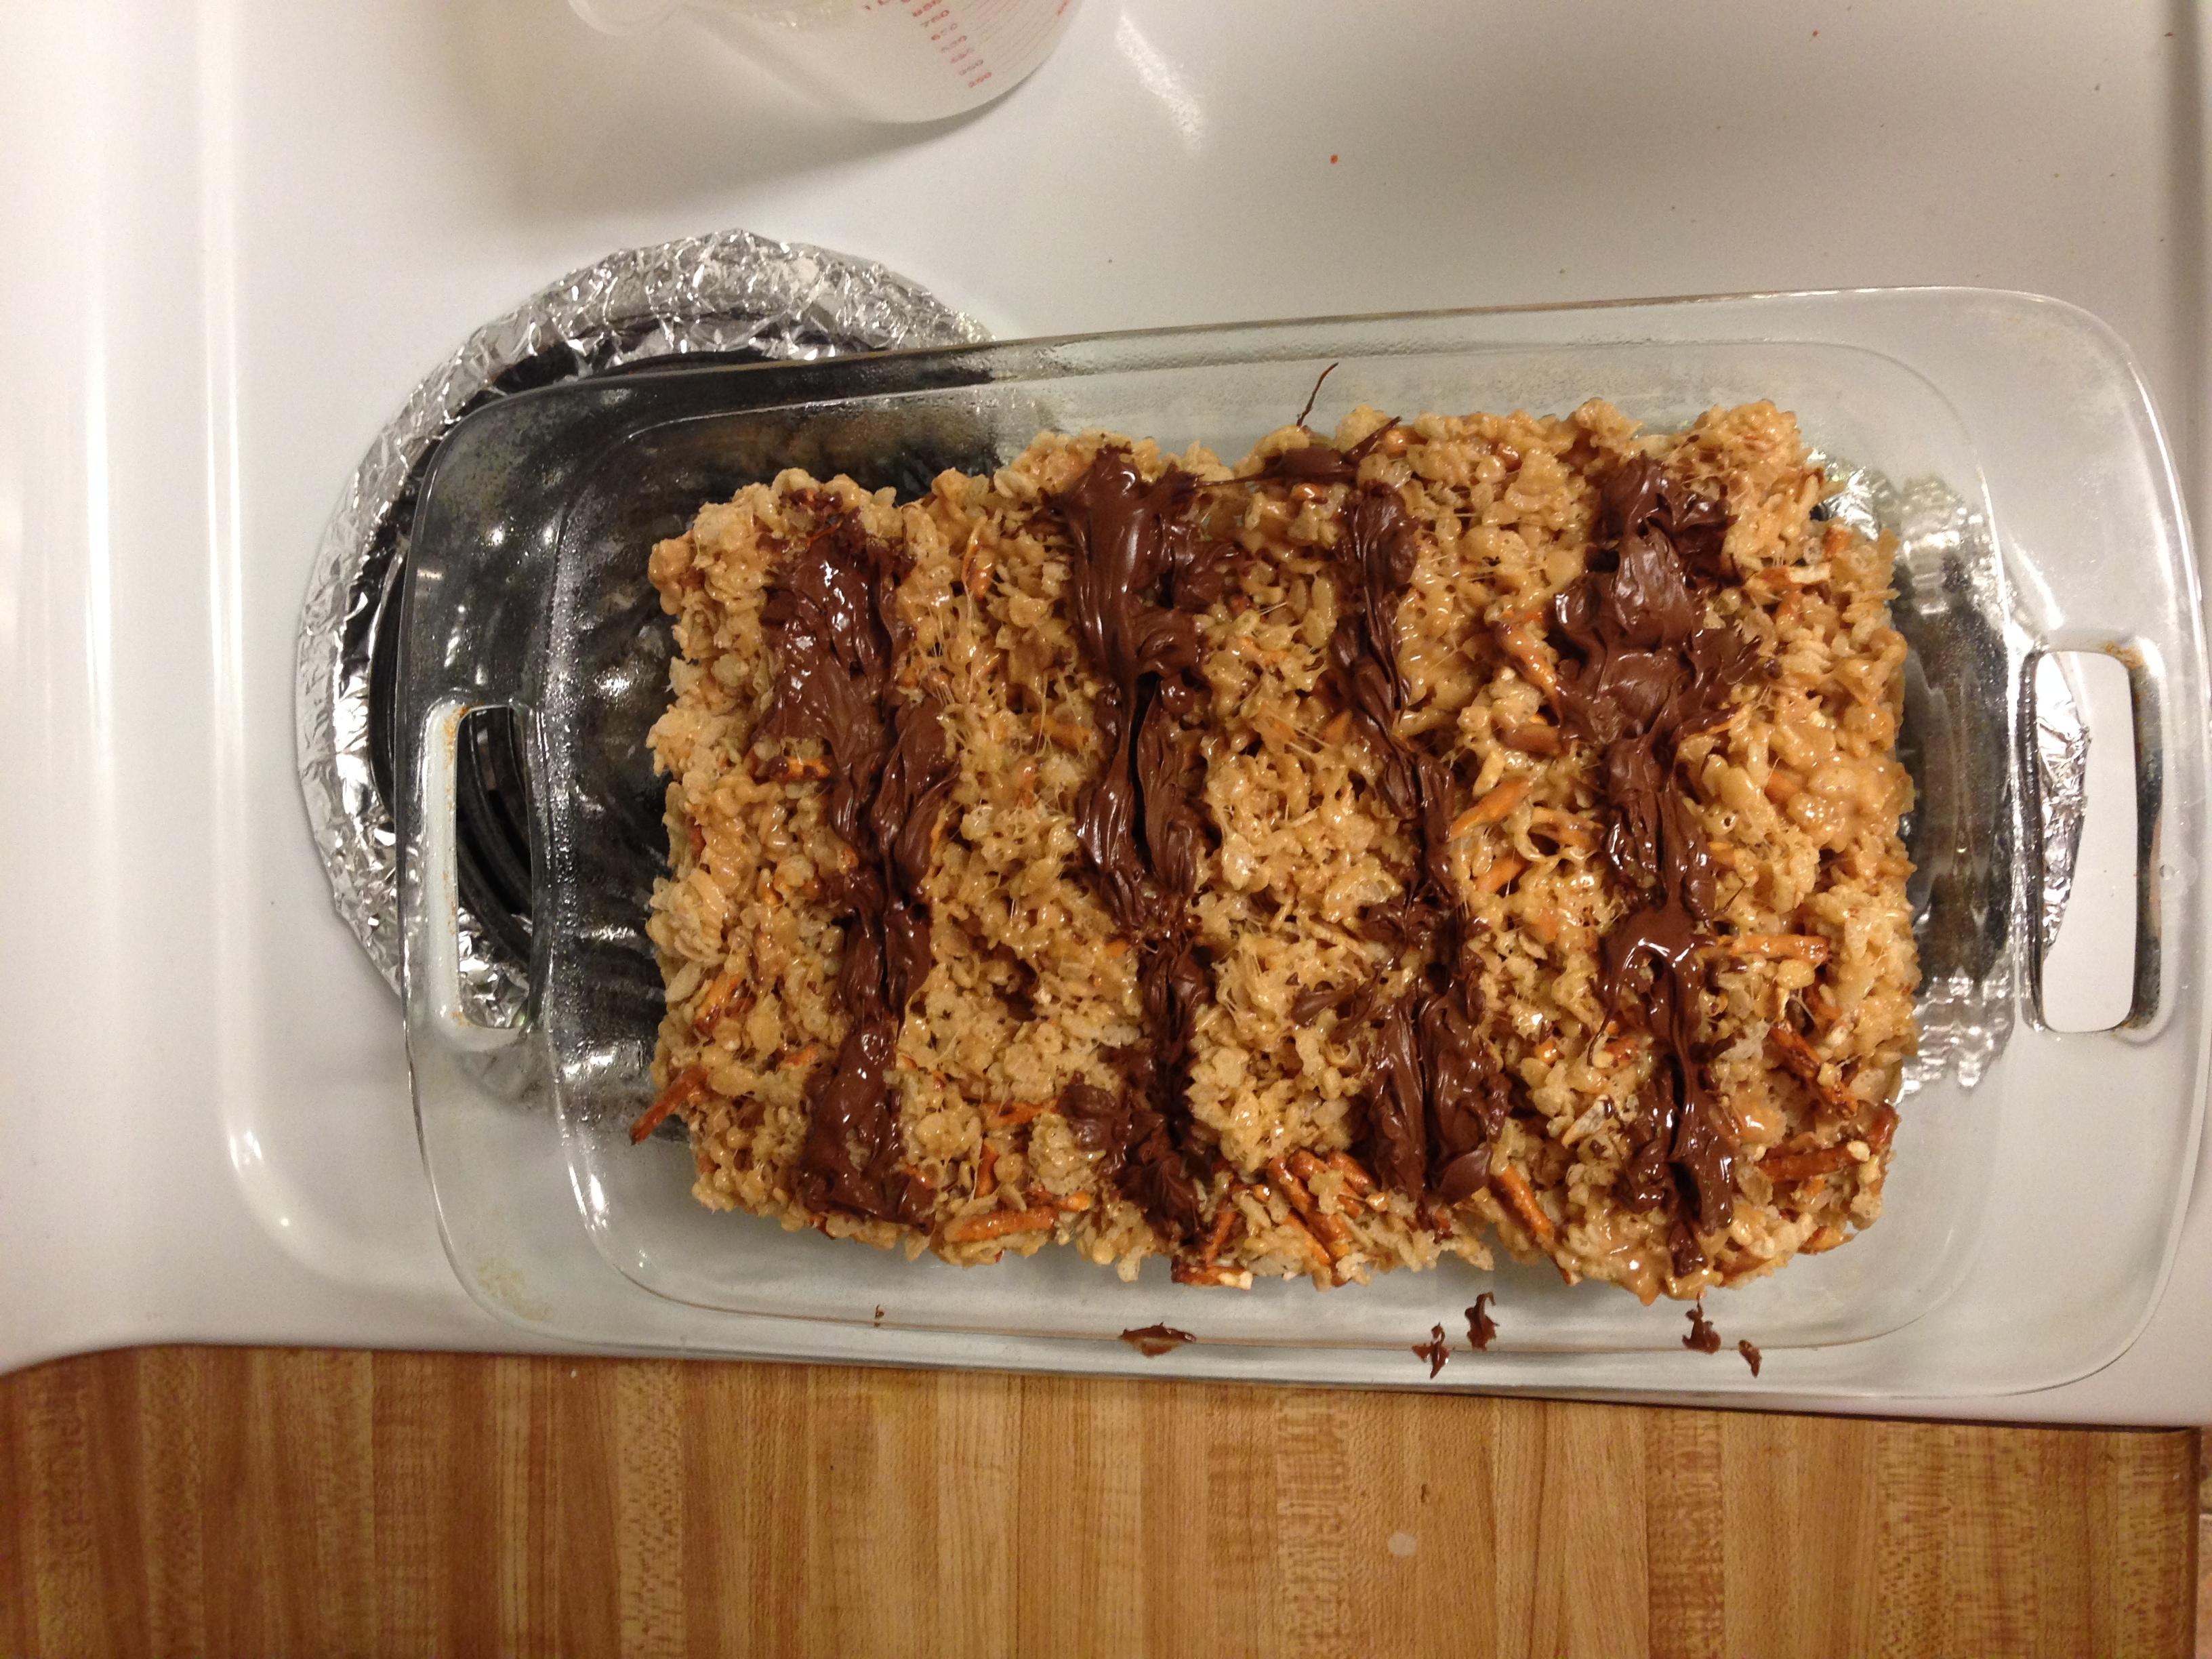 How- To make Peanut Butter Chocolate Pretzel Rice Crispy Treats